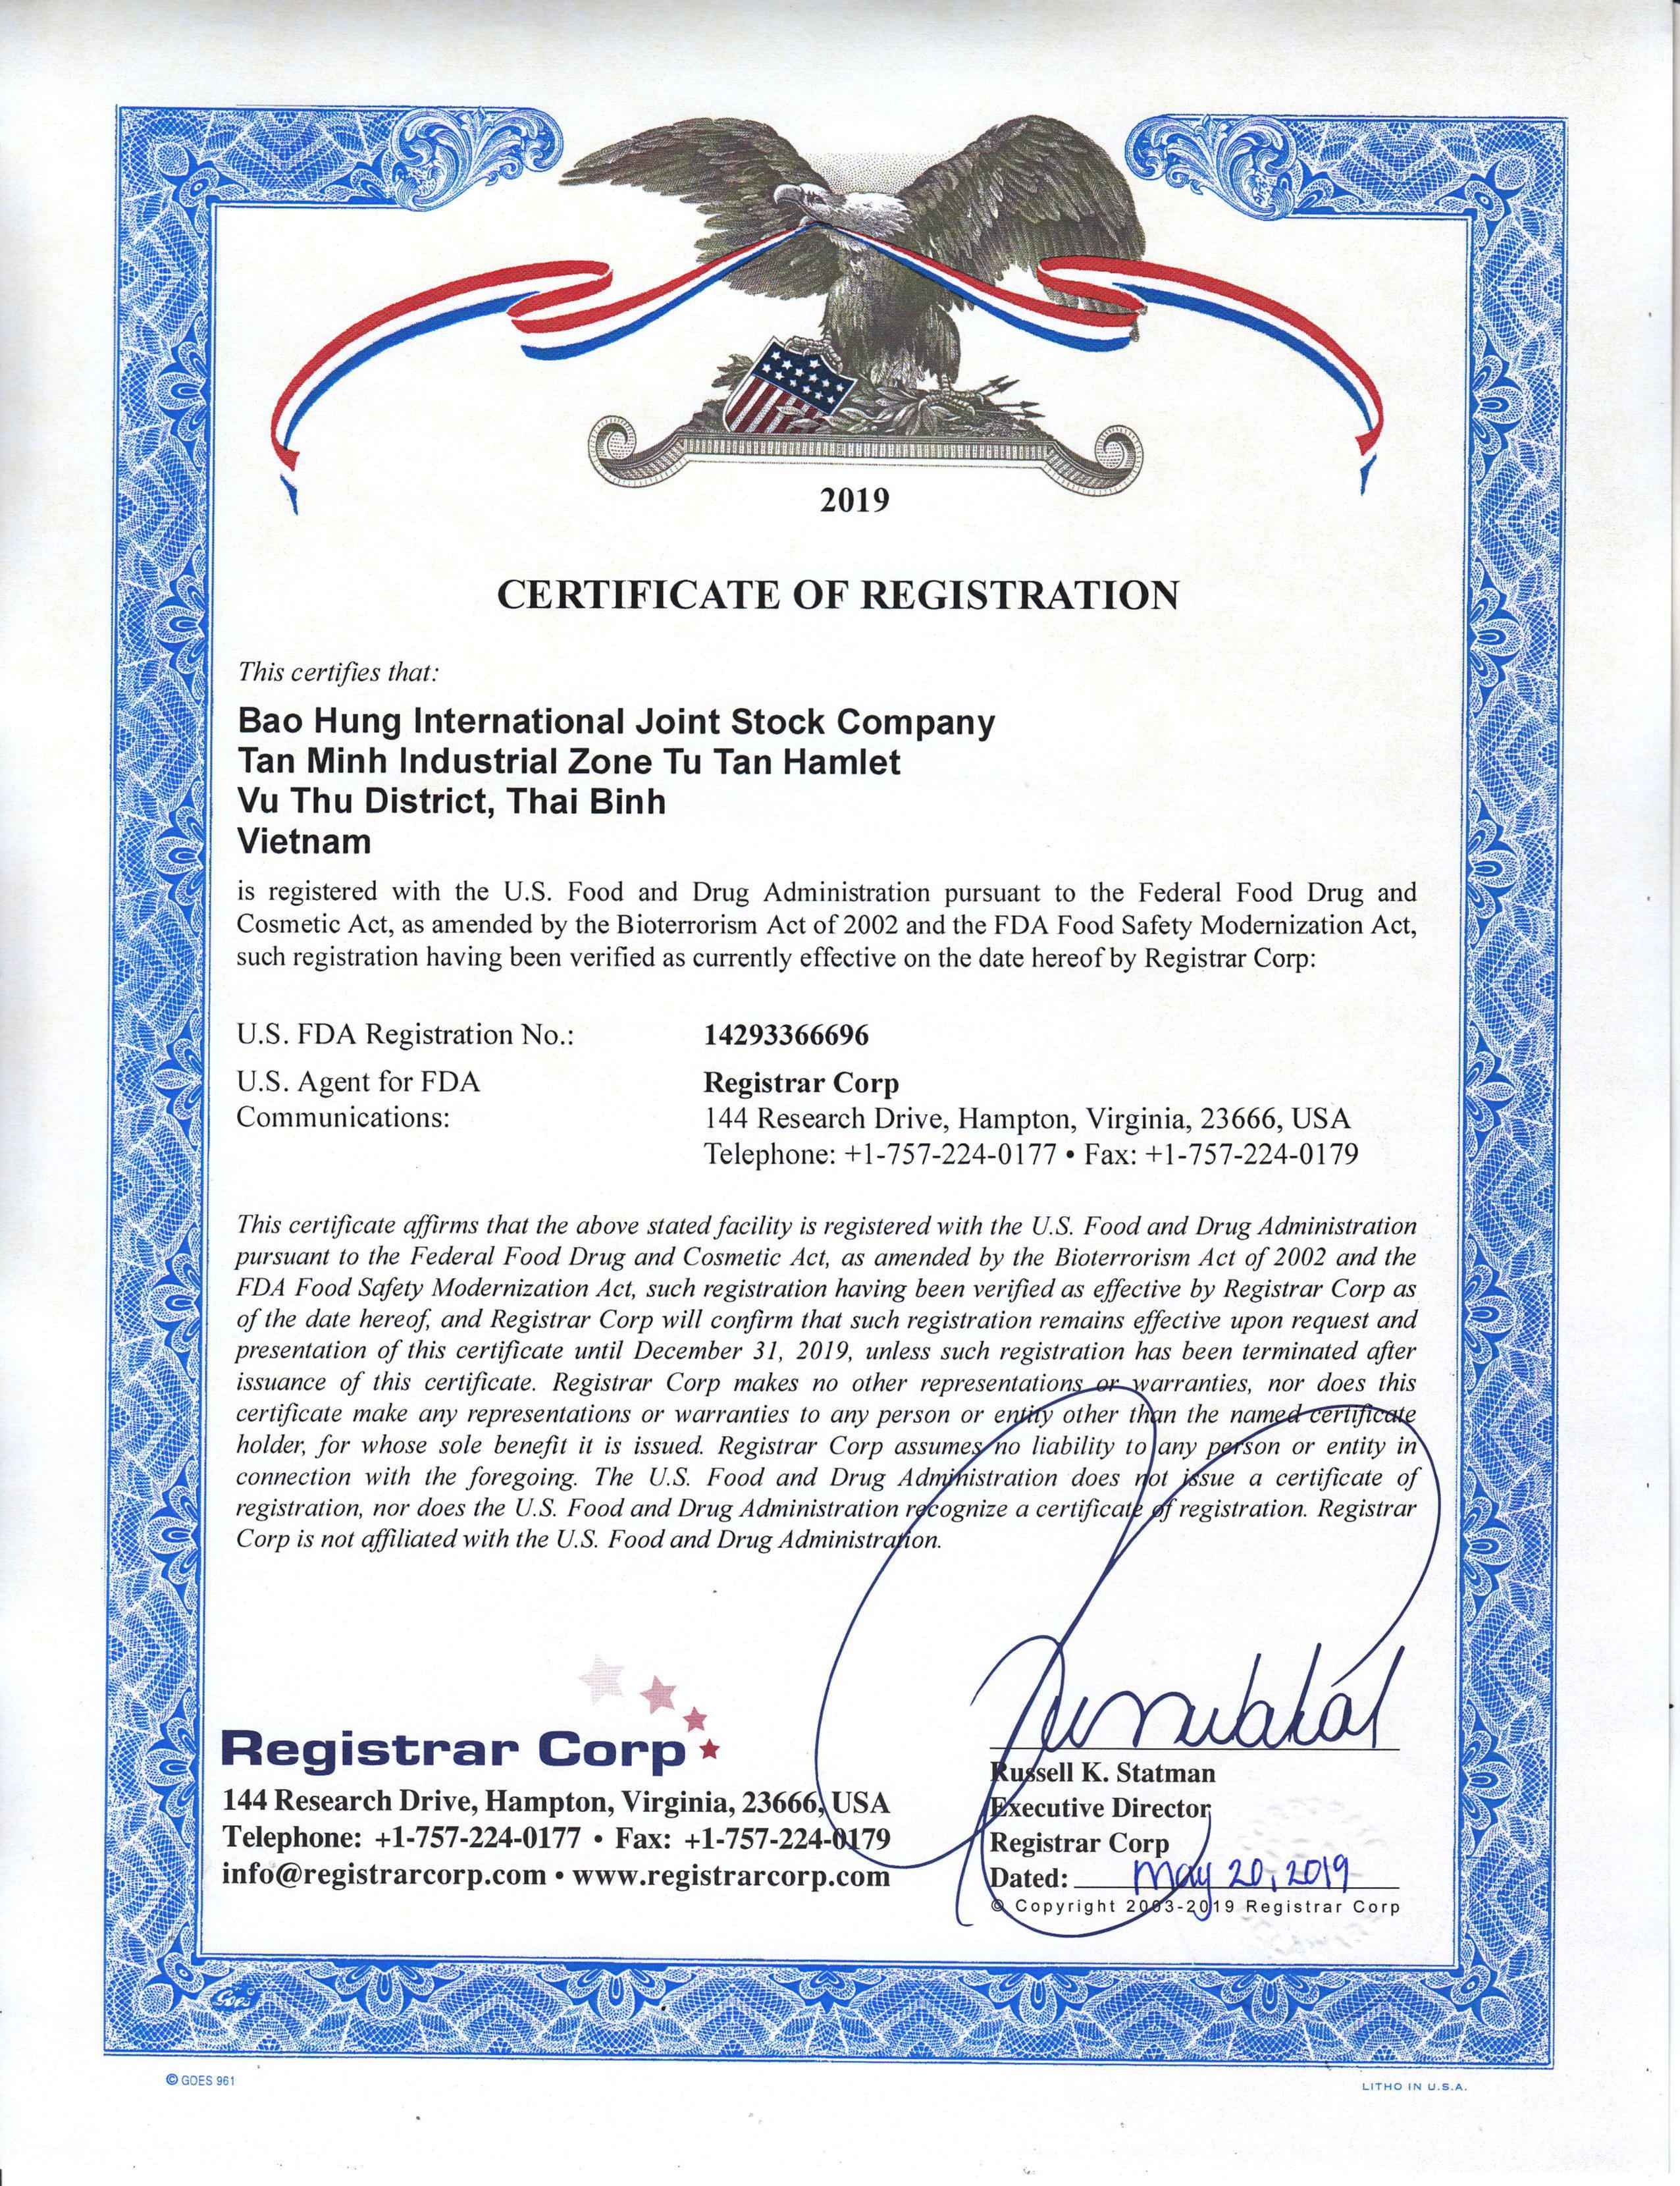 Bao Hung International Joint Stock Company